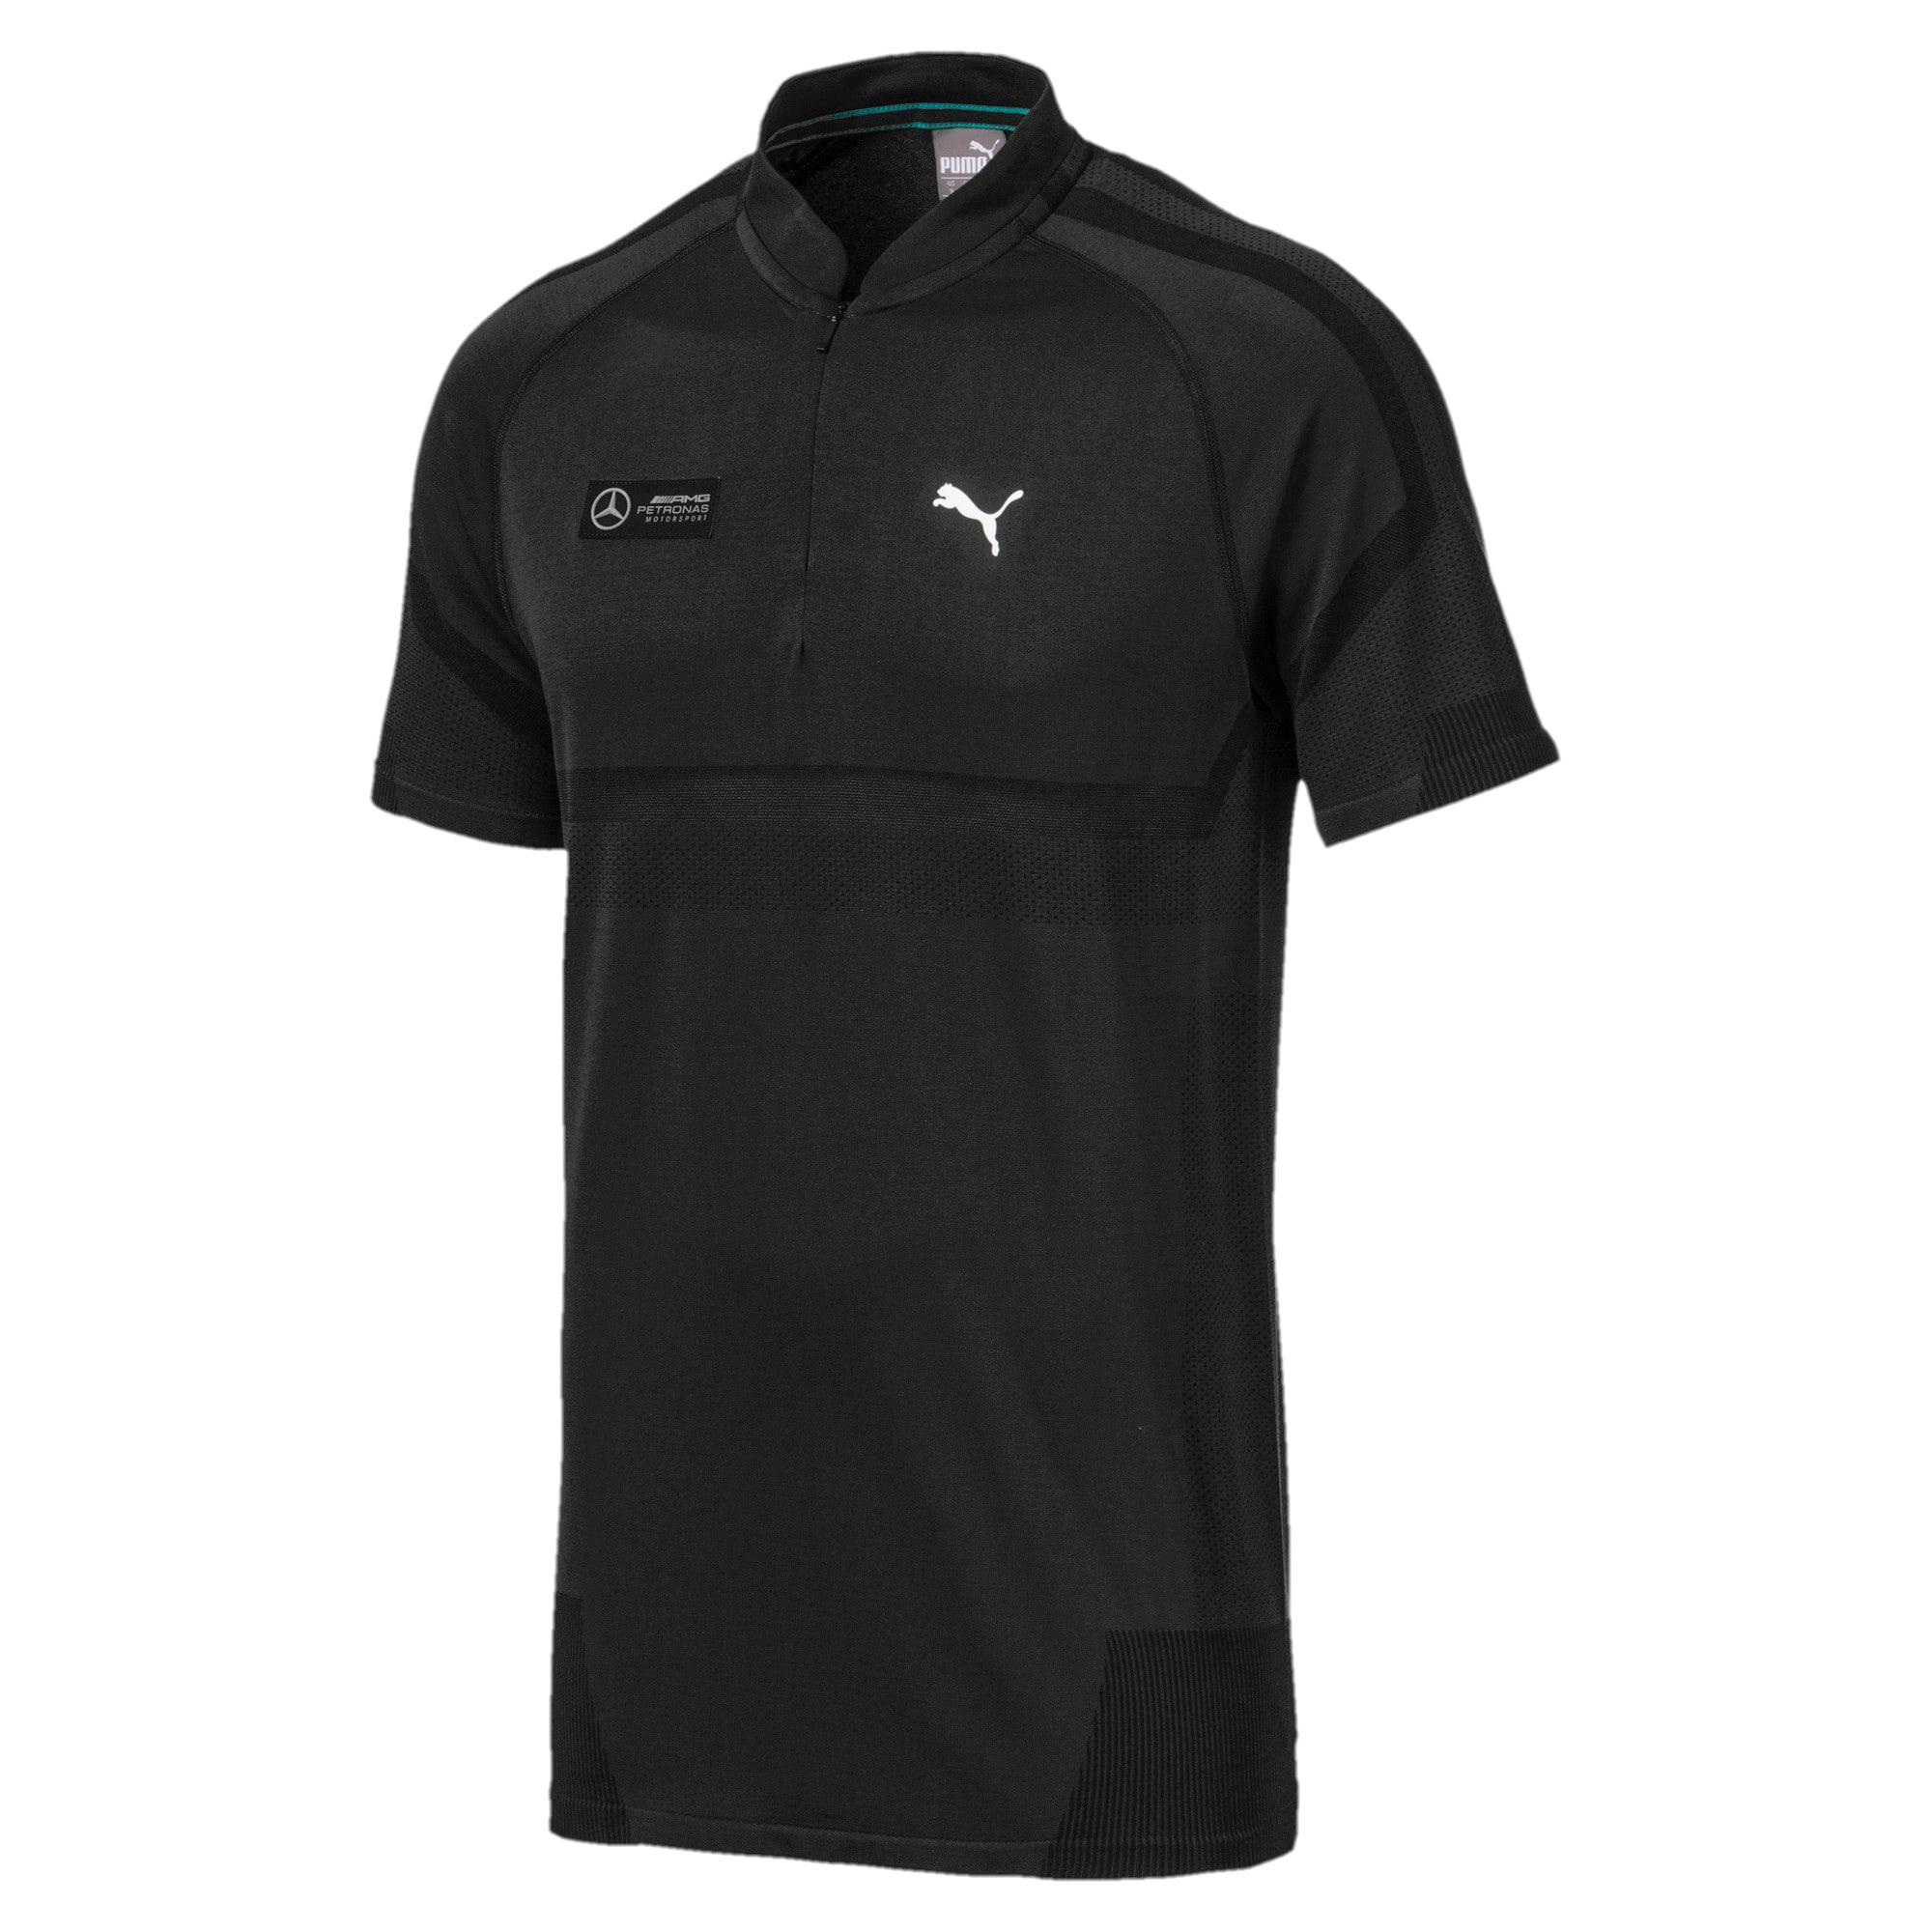 Thumbnail 5 of Mercedes AMG Petronas Men's Polo Shirt, Puma Black, medium